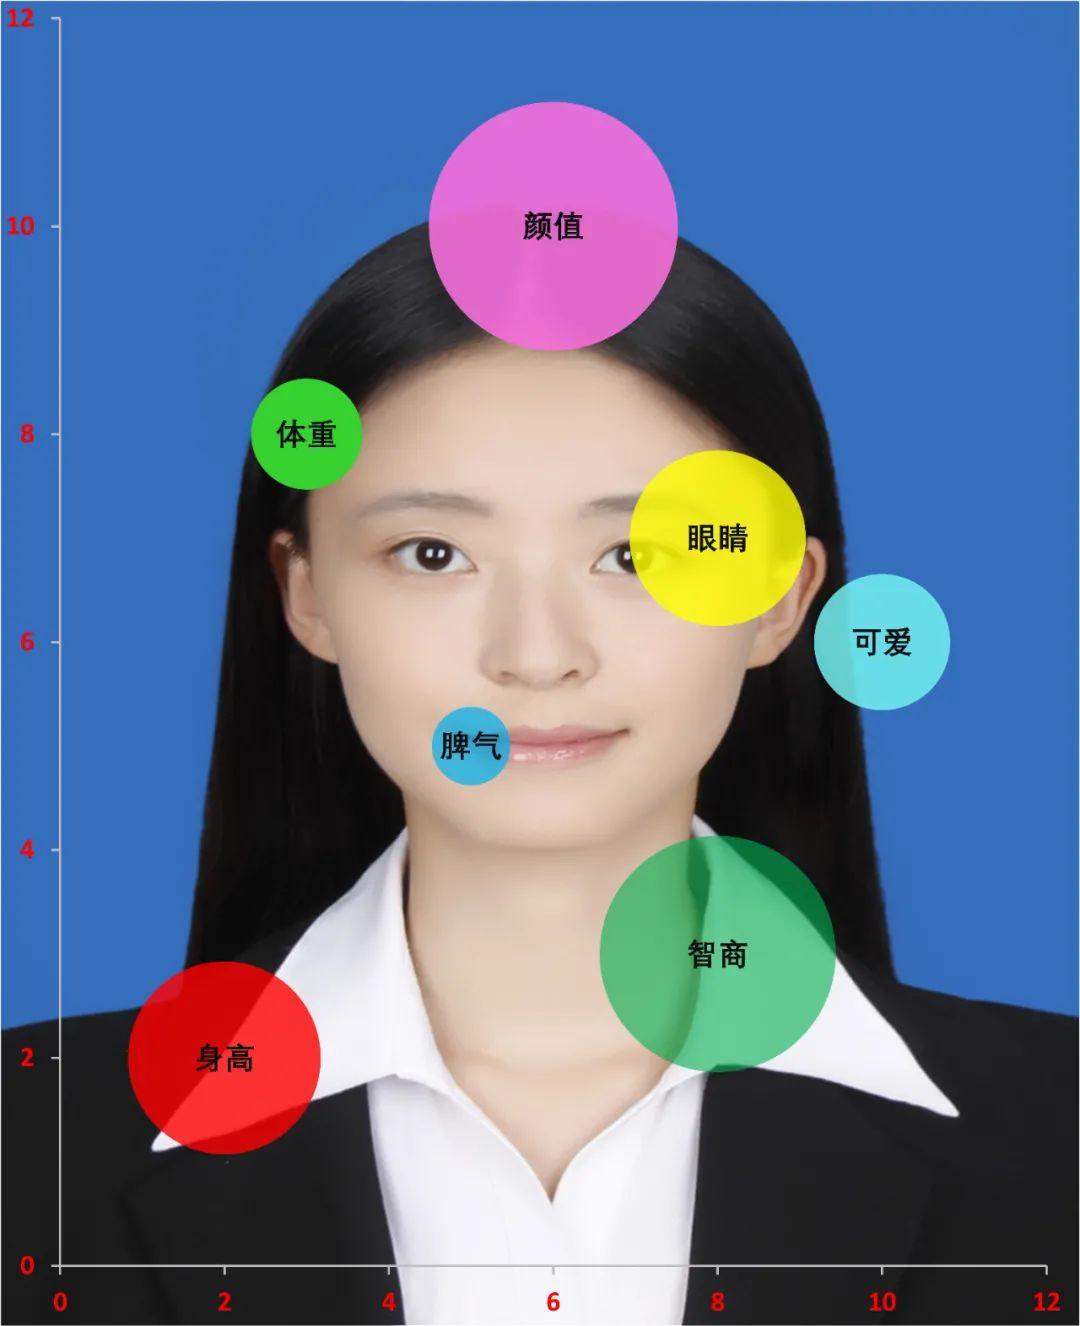 怎么用<a href='/map/qipaotu/' style='color:#000;font-size:14px;'>气泡图</a>夸夸自己的女朋友?